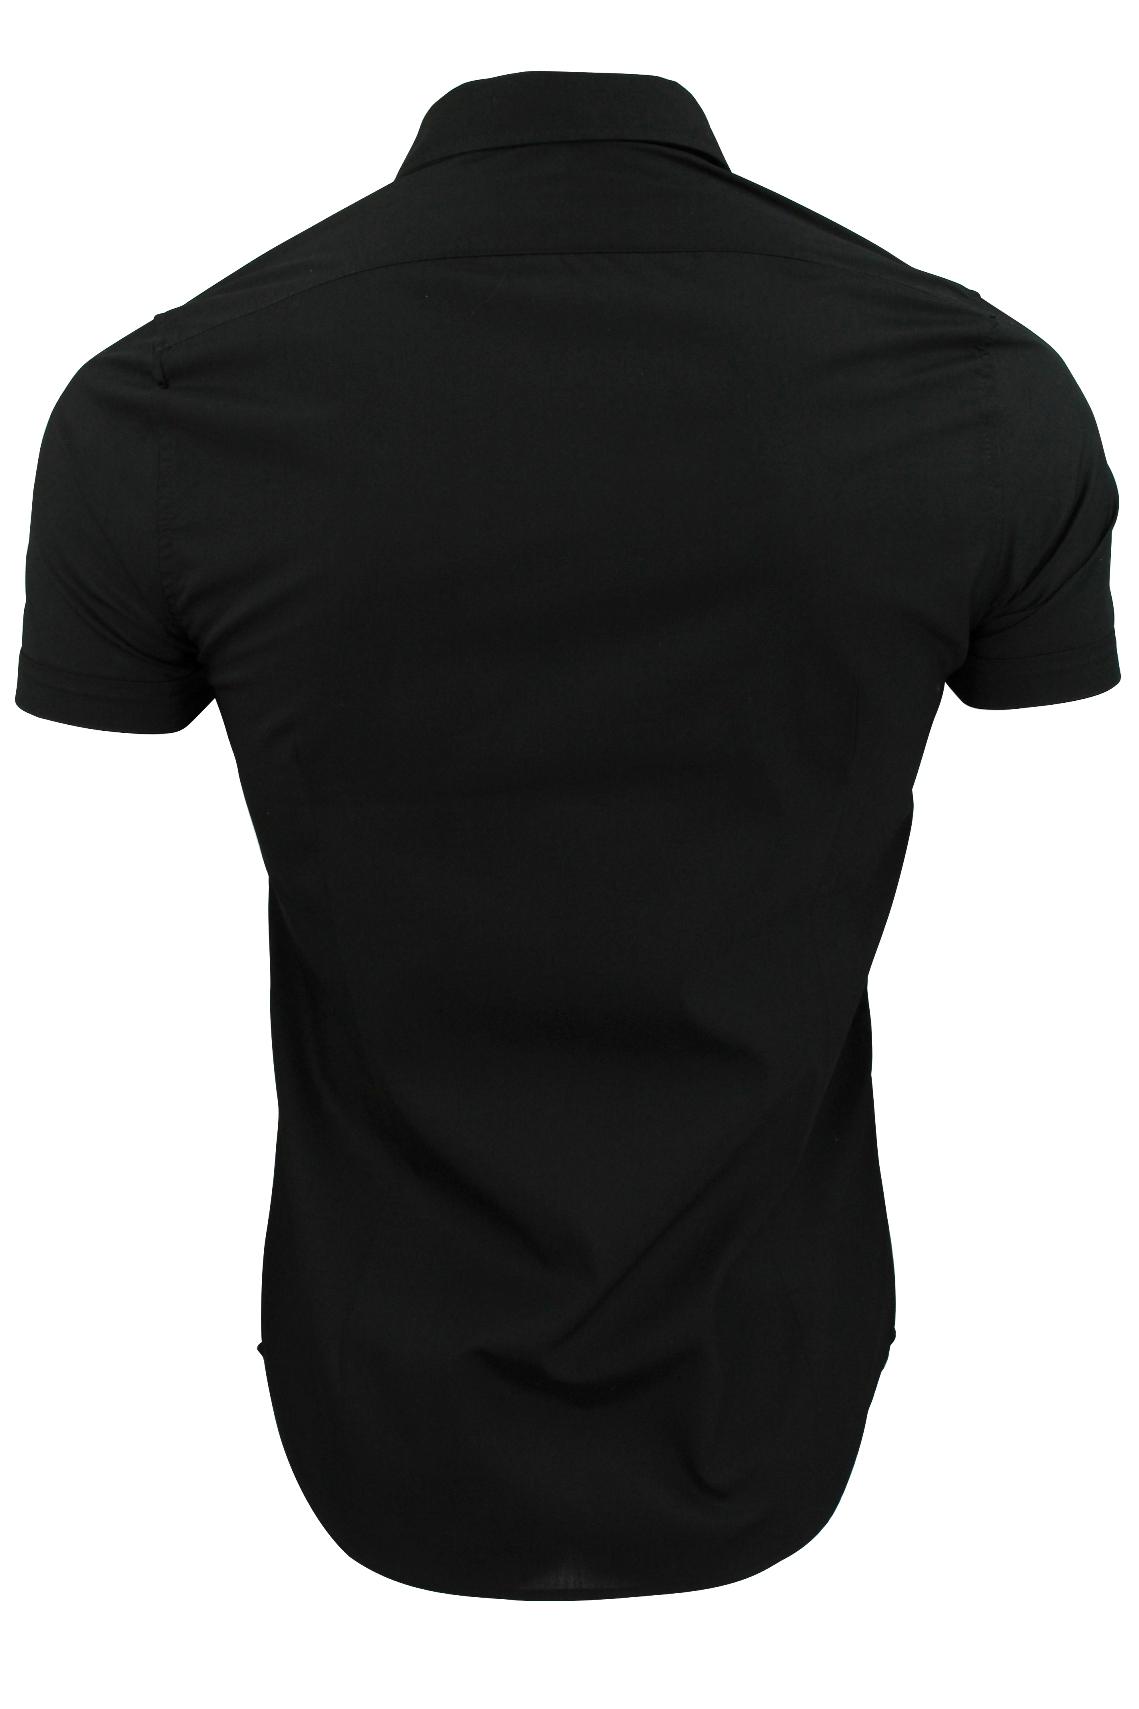 Brave-Soul-Mens-Plain-Shirt-Short-Sleeved-Slim-Fit thumbnail 5